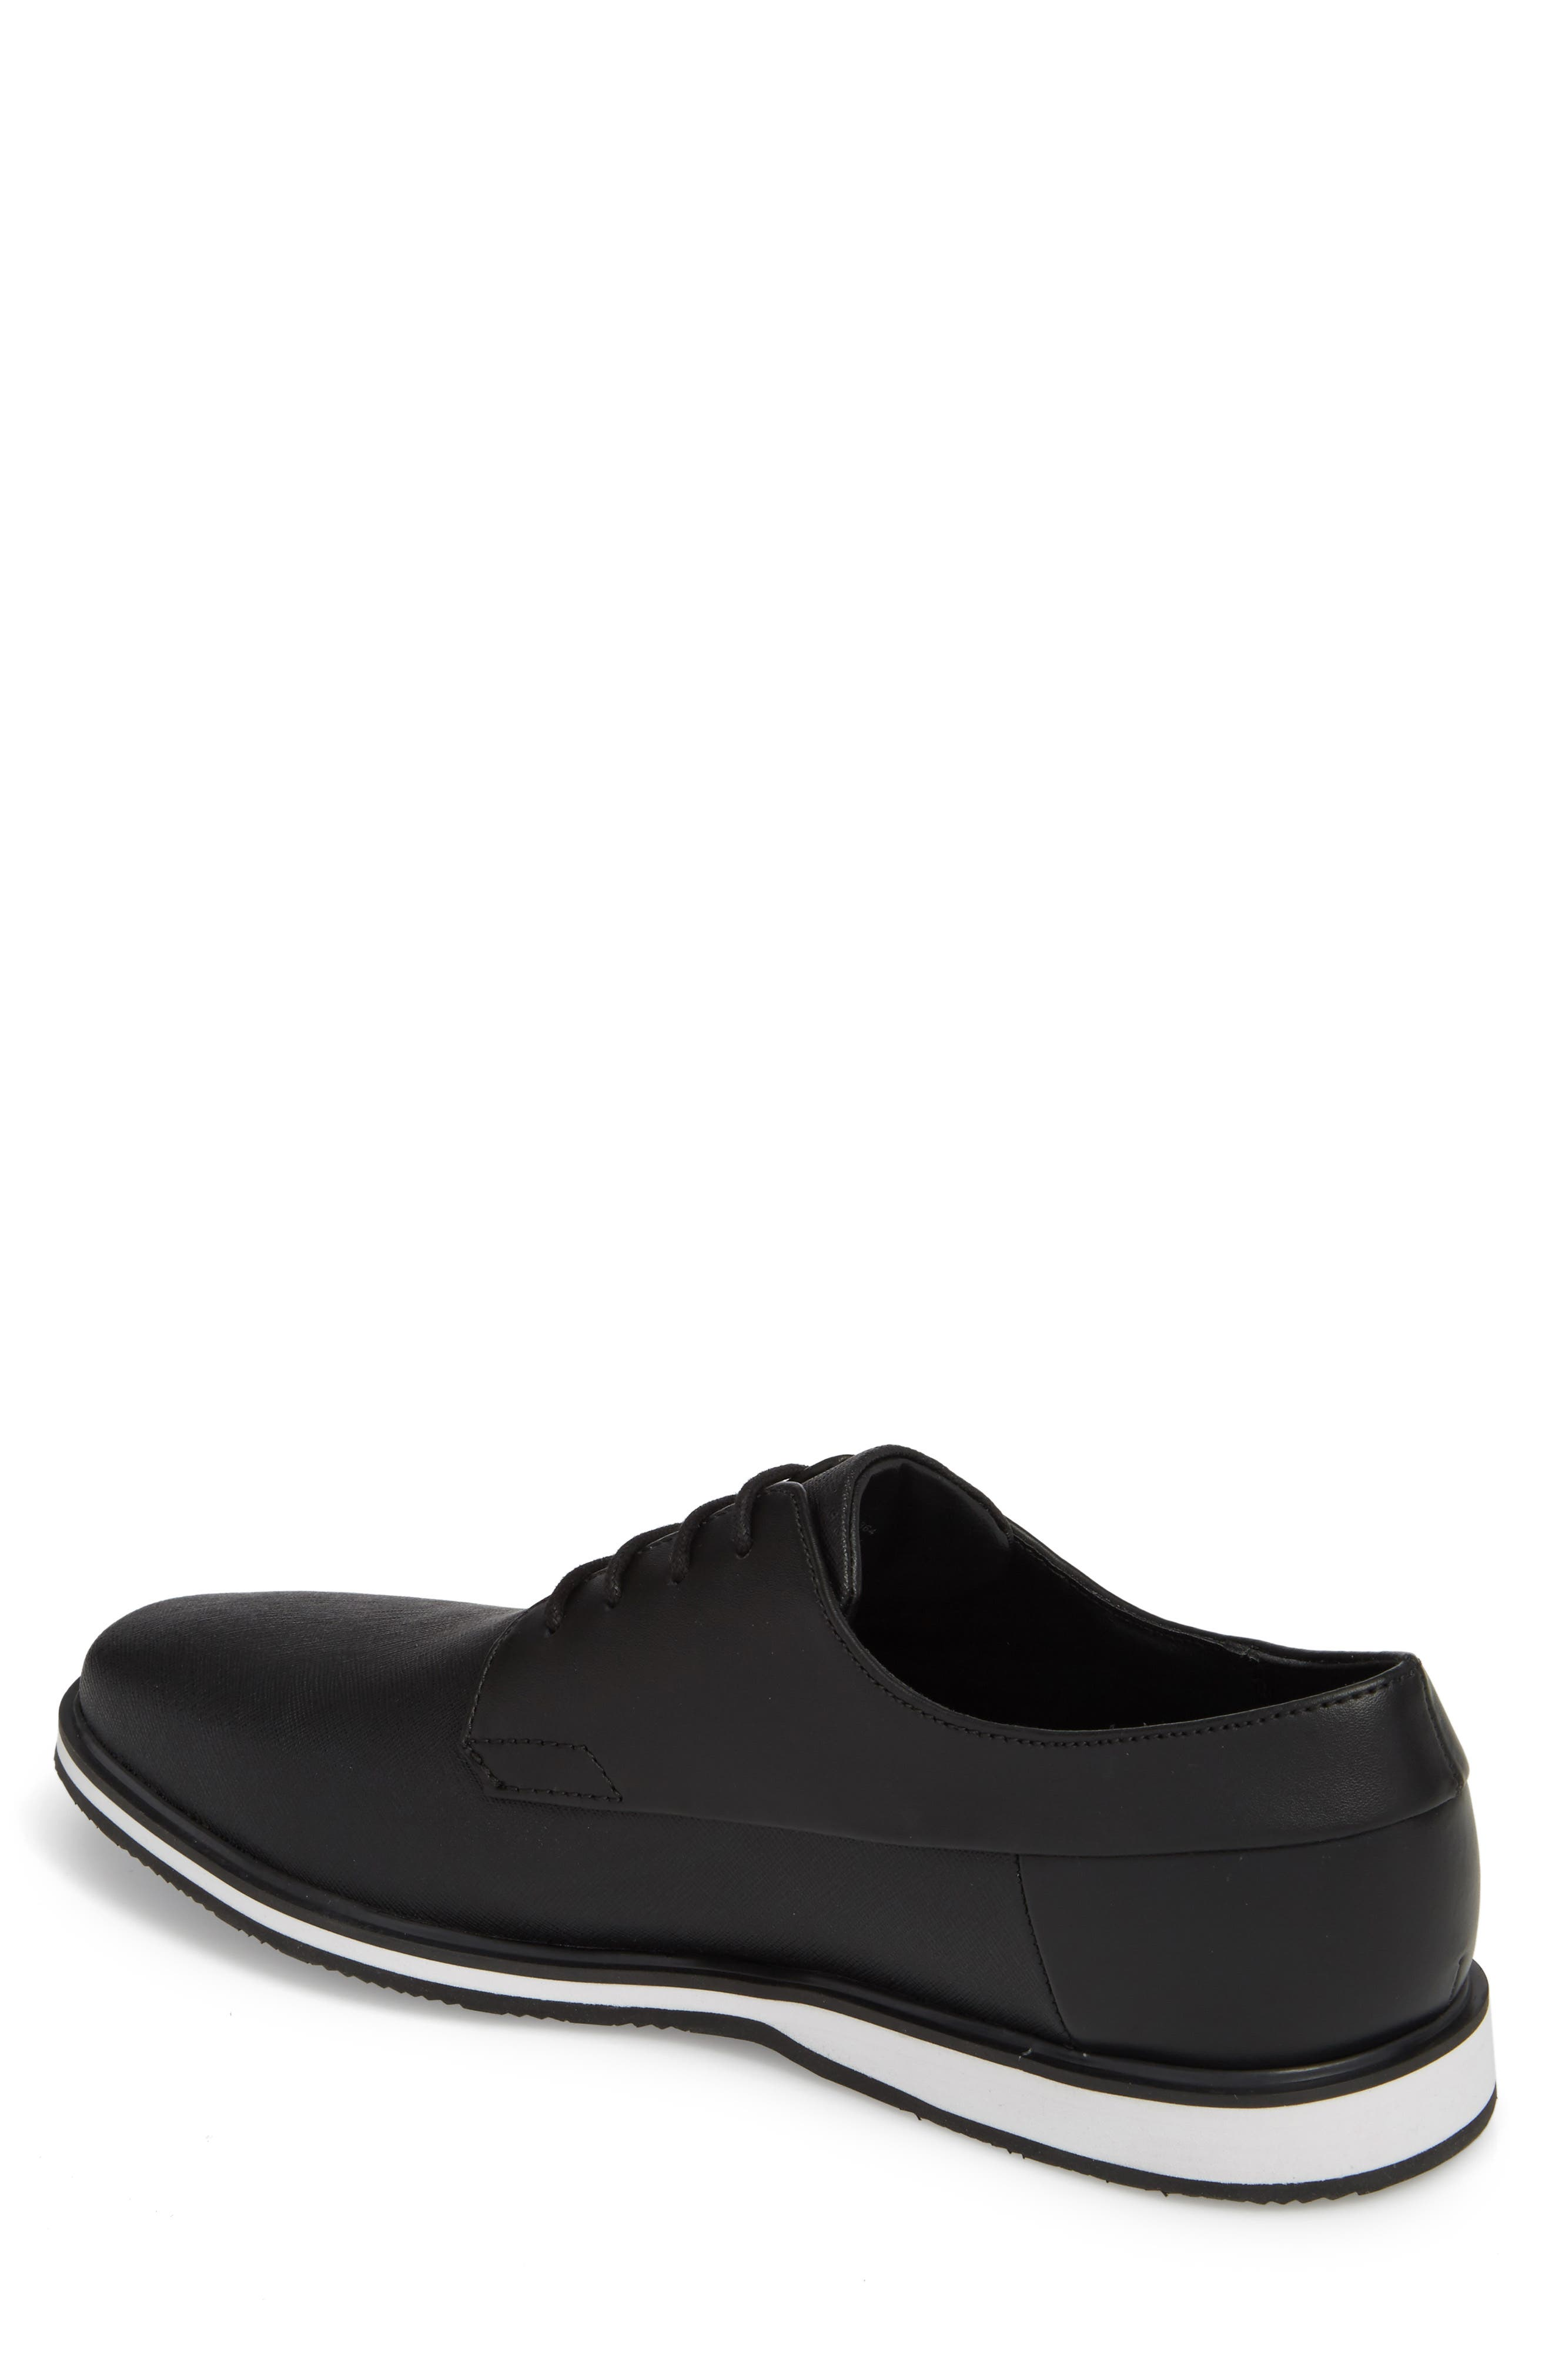 Wilfred Plain Toe Derby,                             Alternate thumbnail 2, color,                             Black